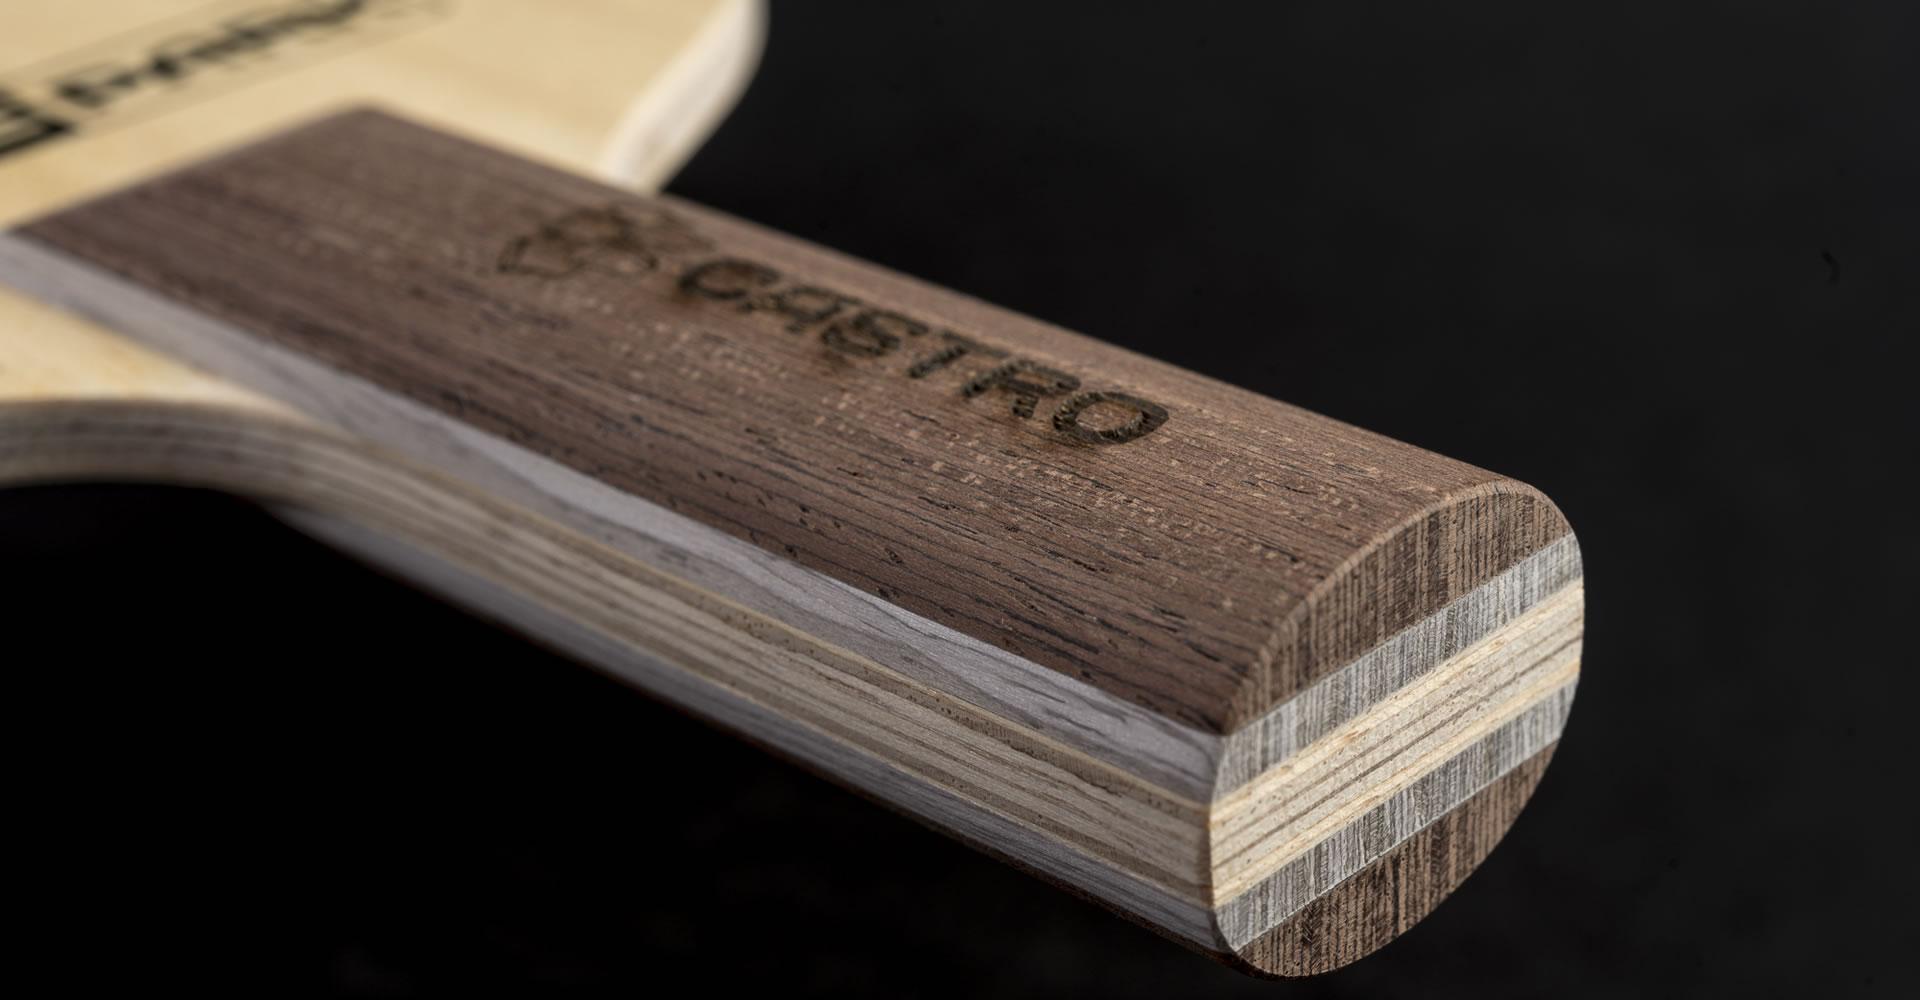 PiMPLEPARK Holz CASTRO